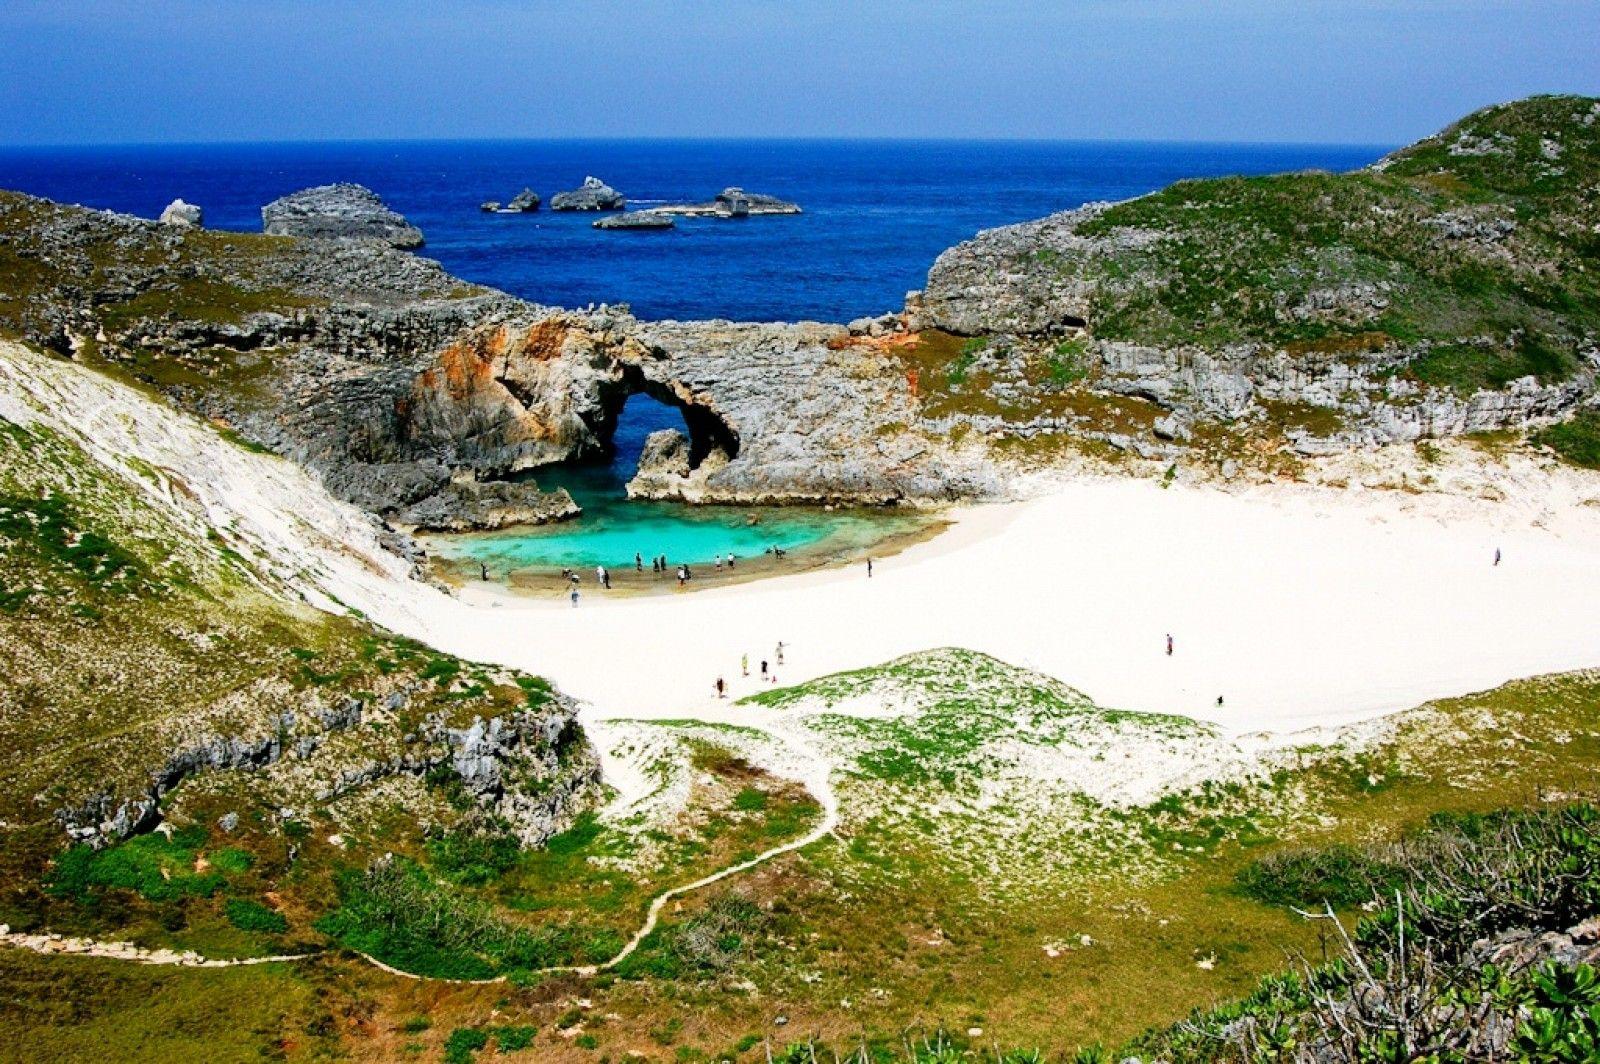 Картинки по запросу bonin islands